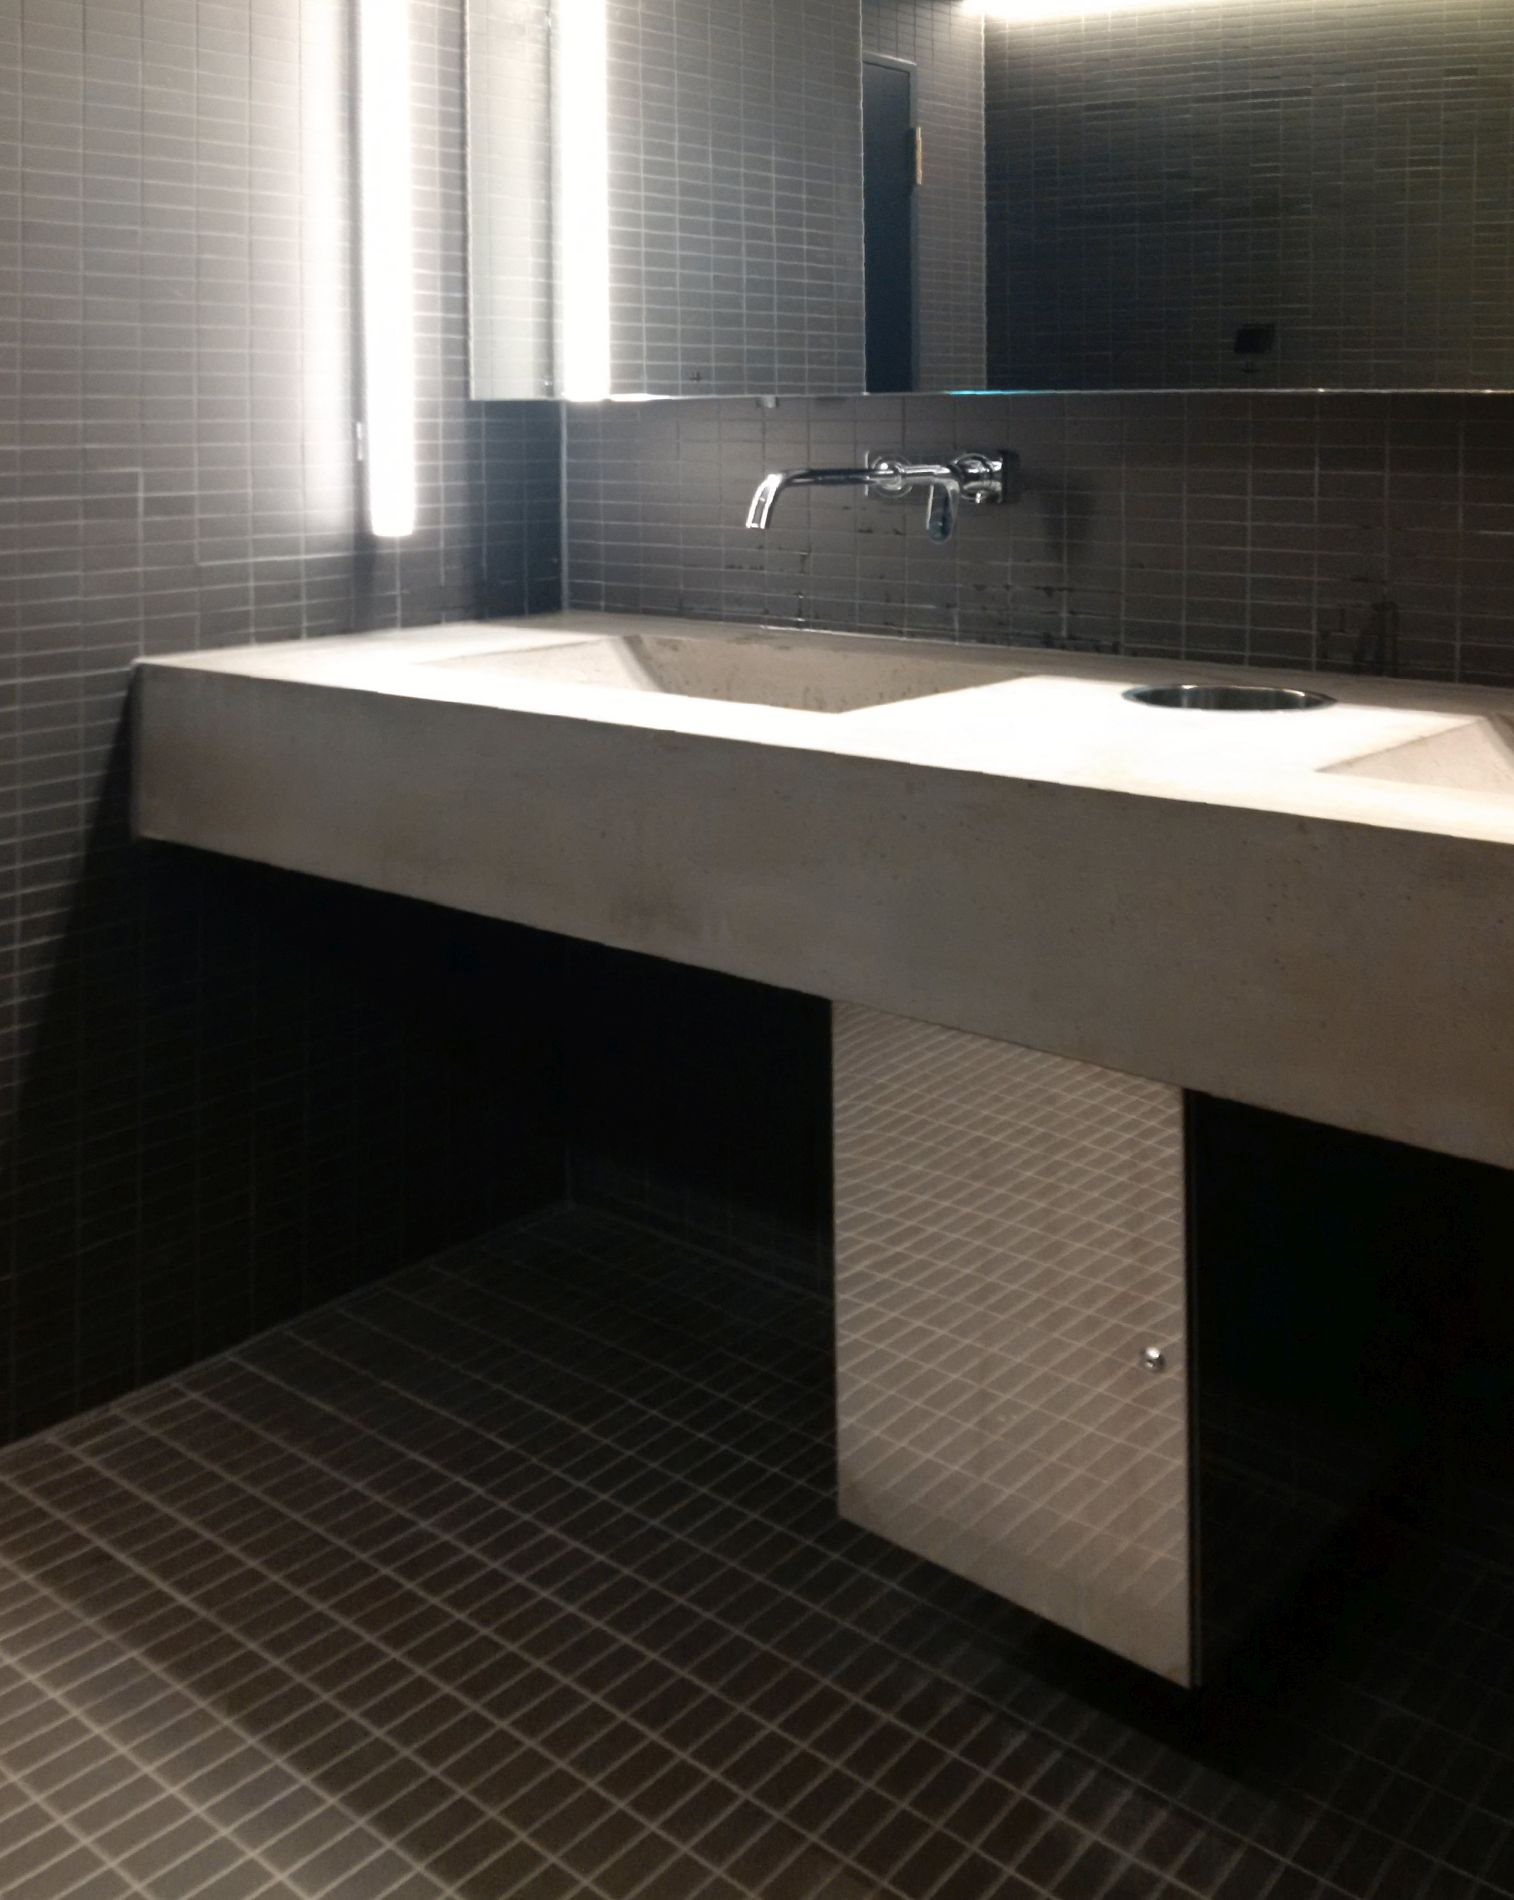 suchergebnisse gtf freese gruppe fussbodentechnik. Black Bedroom Furniture Sets. Home Design Ideas